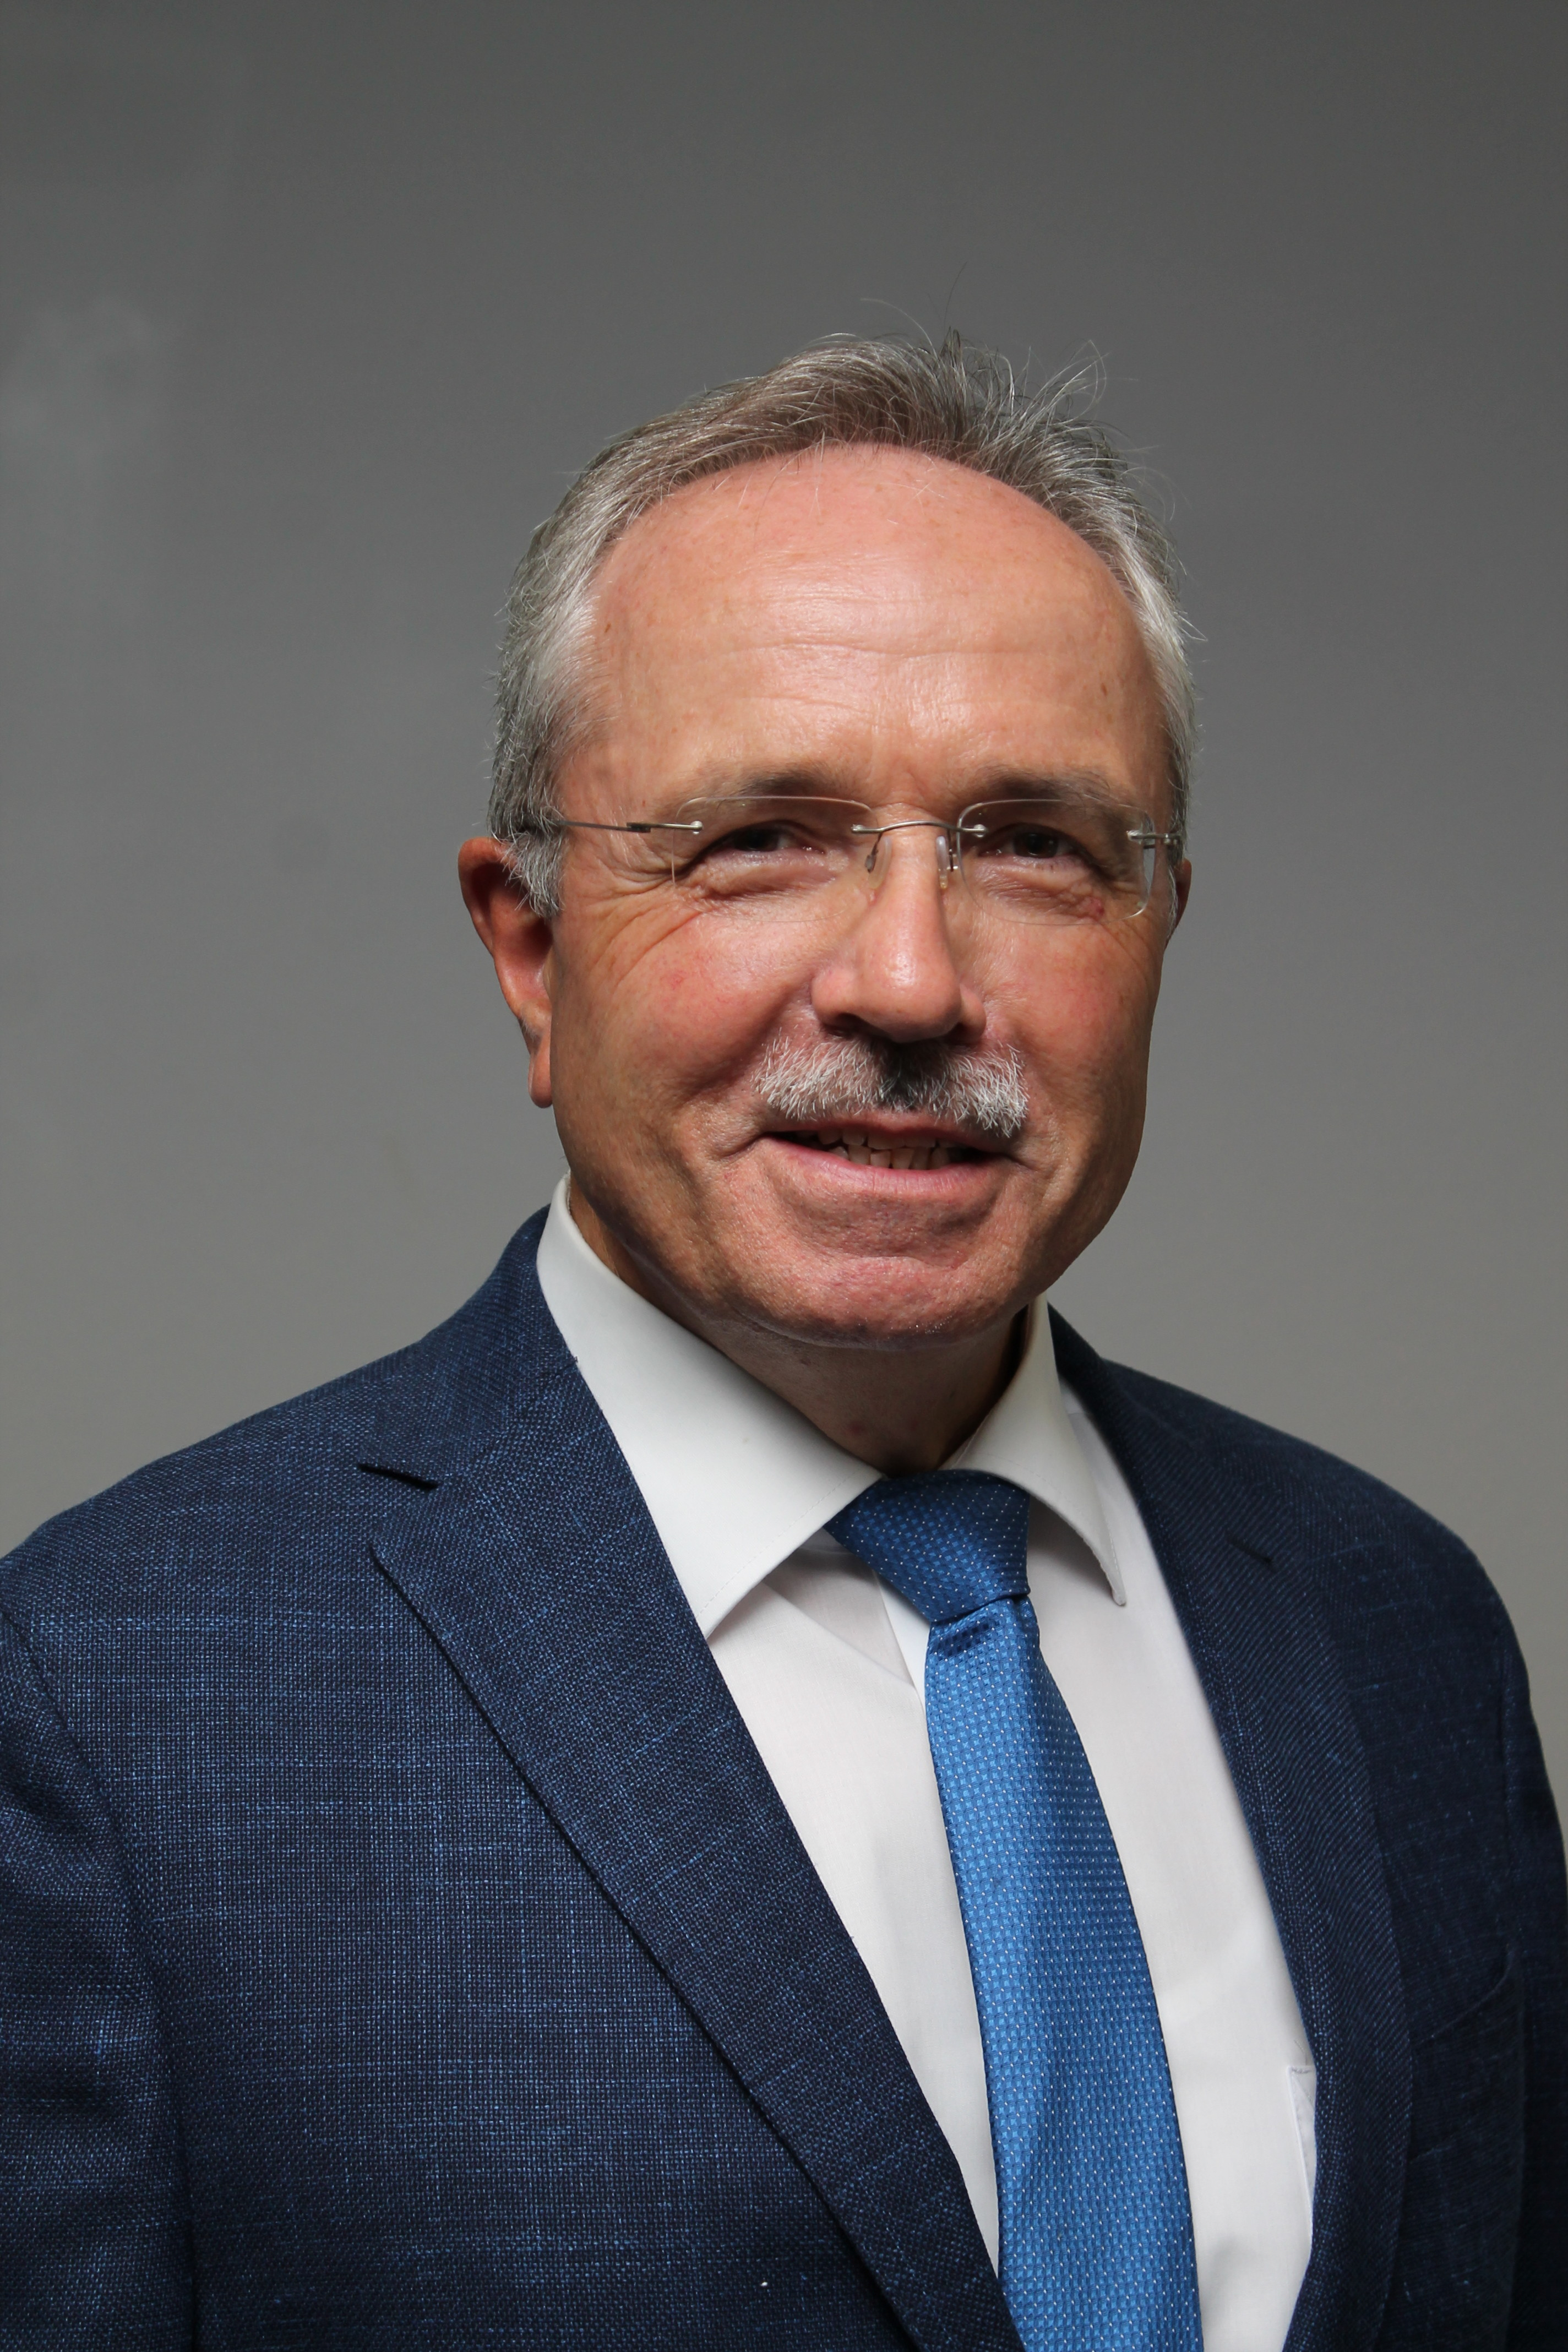 Bernhard Michels